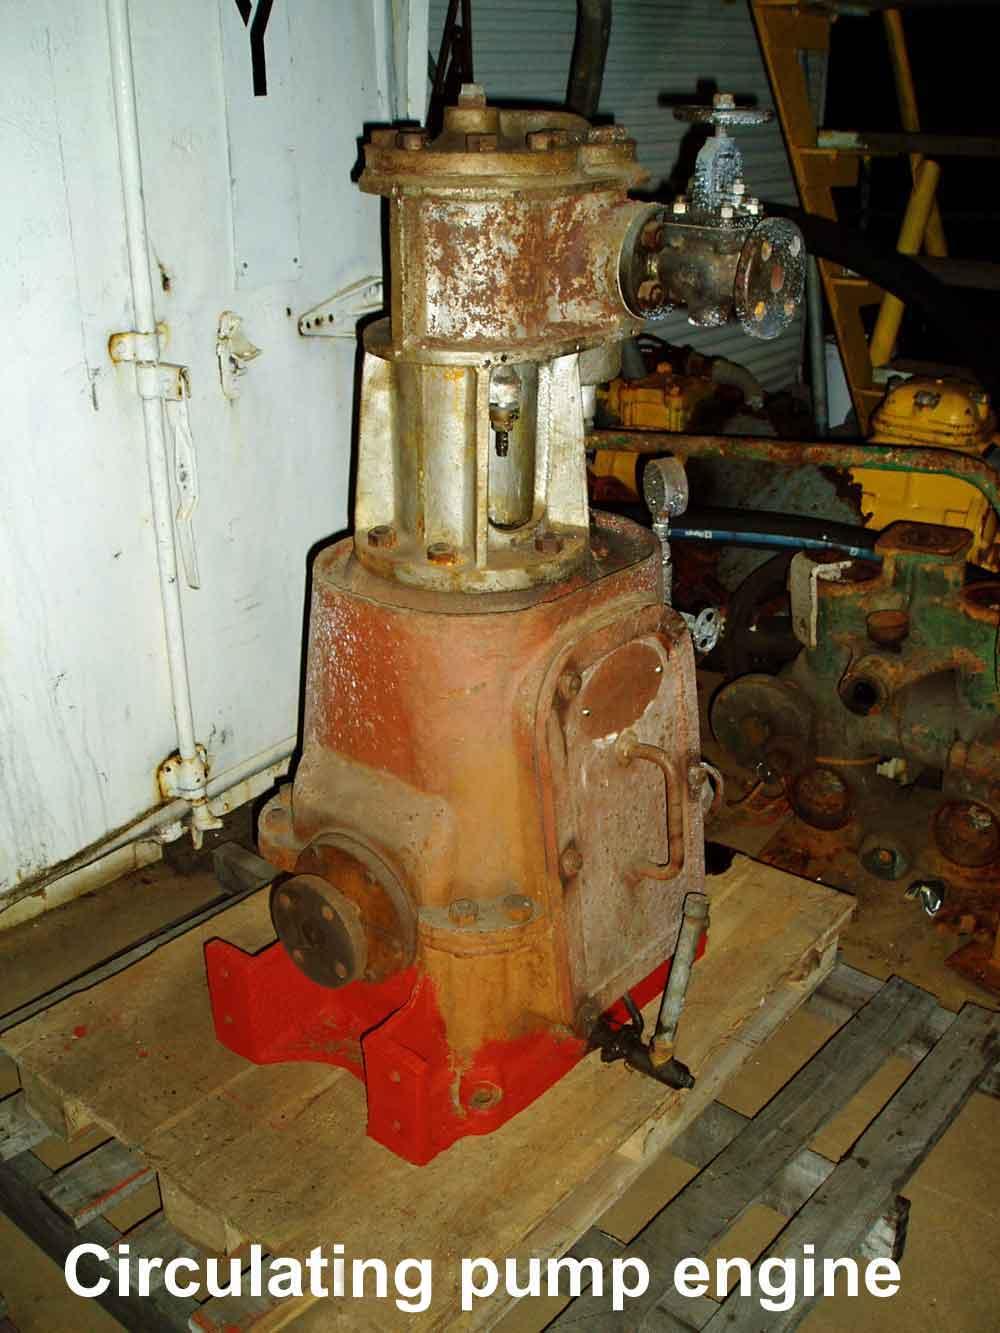 Matthew Paul circulating pump engine before restoration